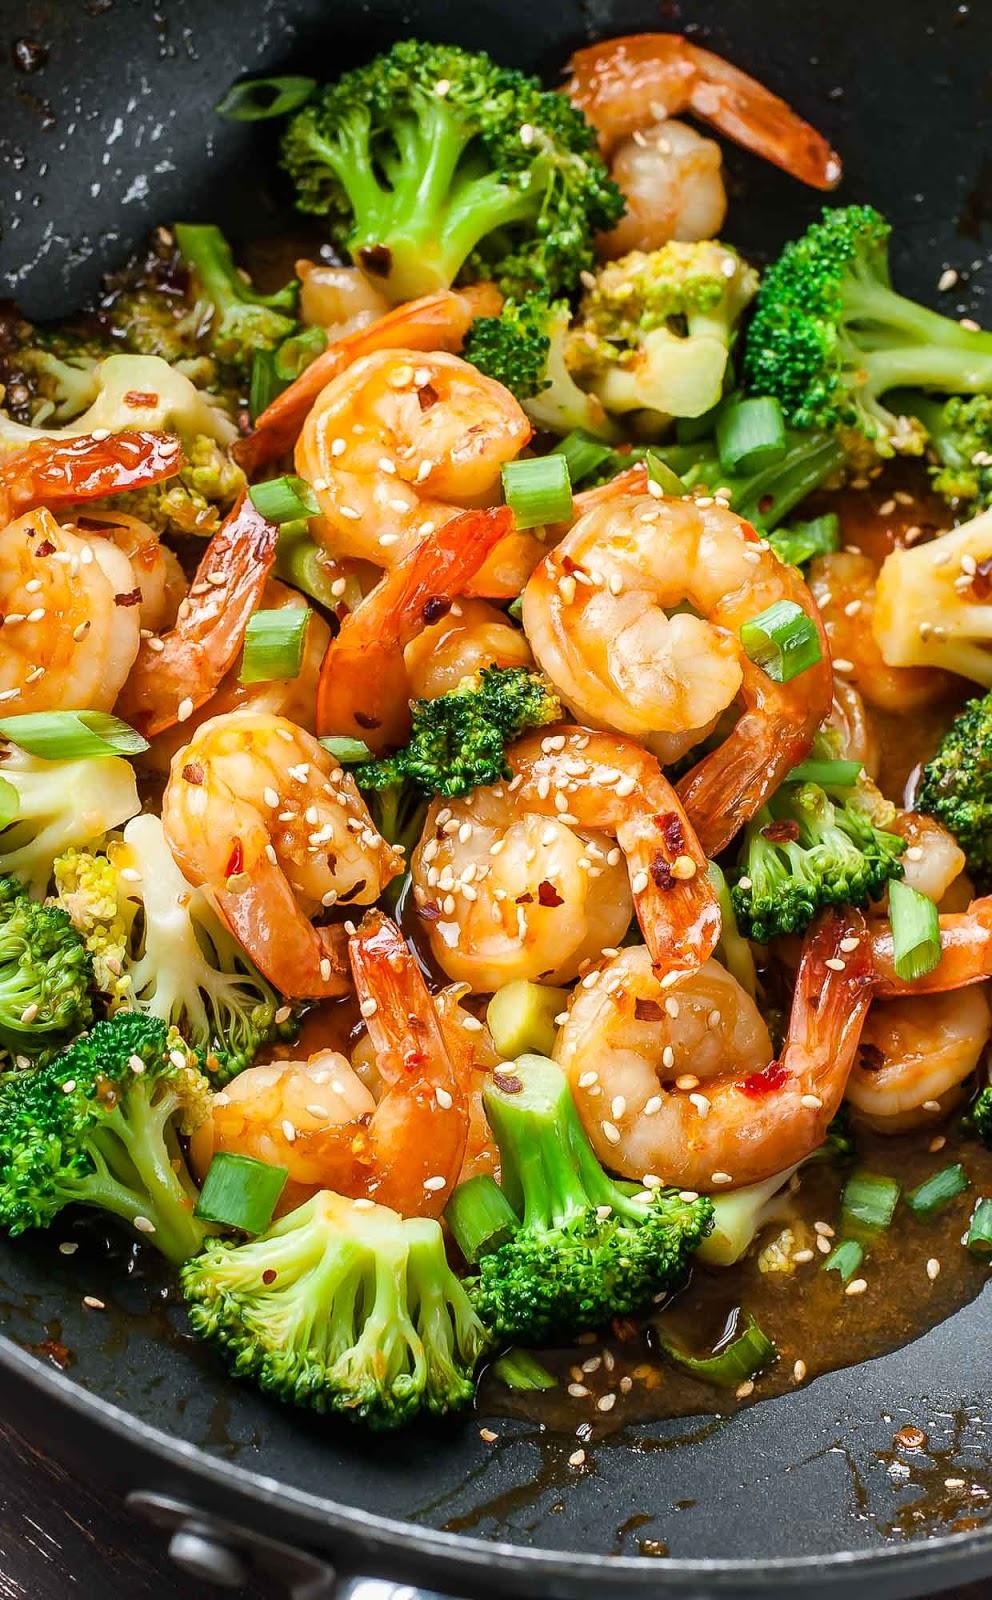 20-Minute Skinny Sriracha Shrimp and Broccoli #20-Minute #Skinny #Sriracha #ShrimpandBroccoli #20-MinuteSkinnySrirachaShrimpandBroccoli